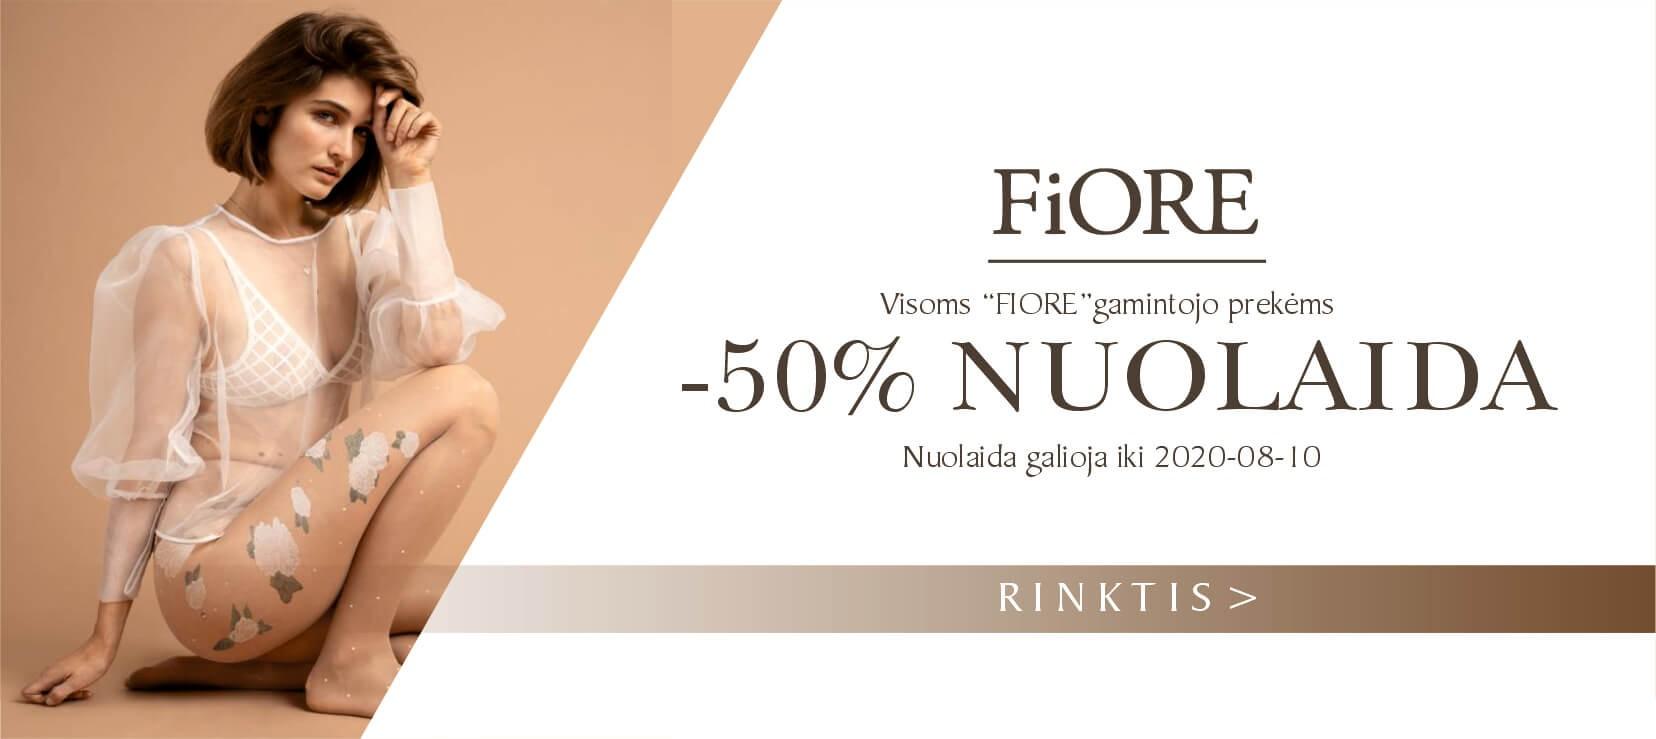 Fiore -50